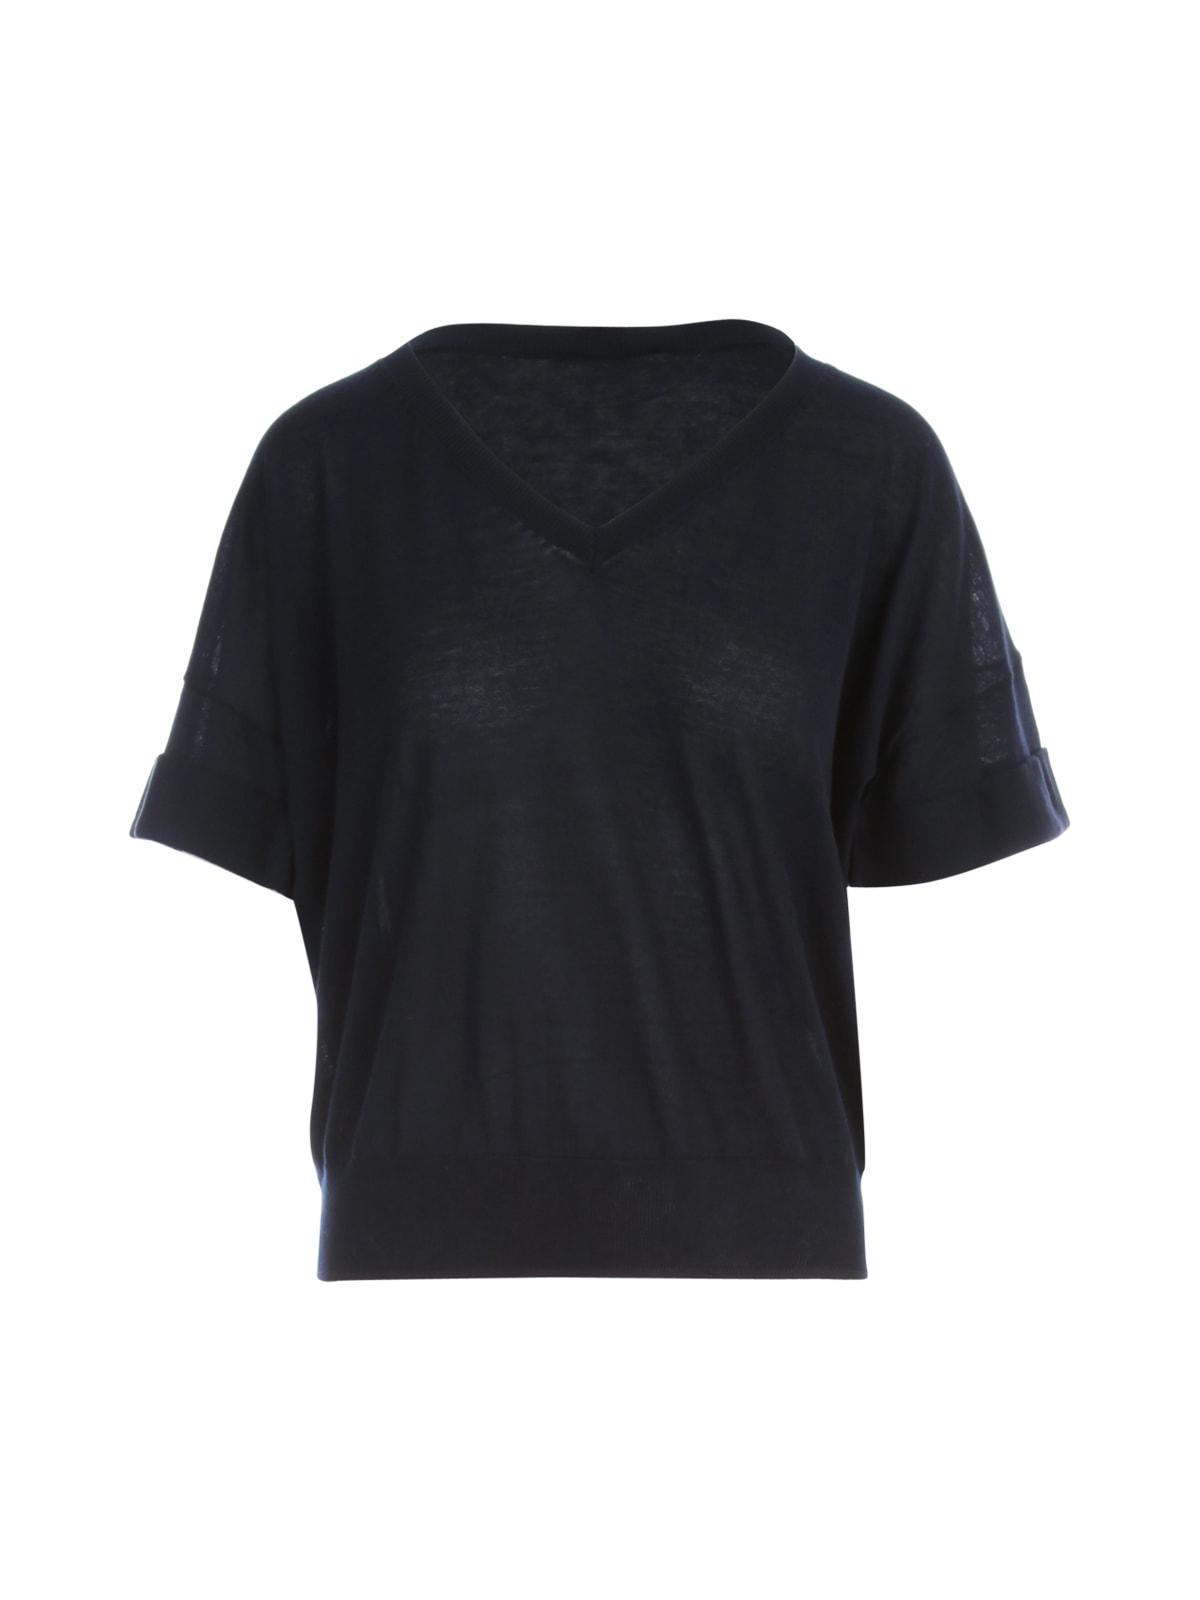 Cotton V Neck 3/4s Sweater